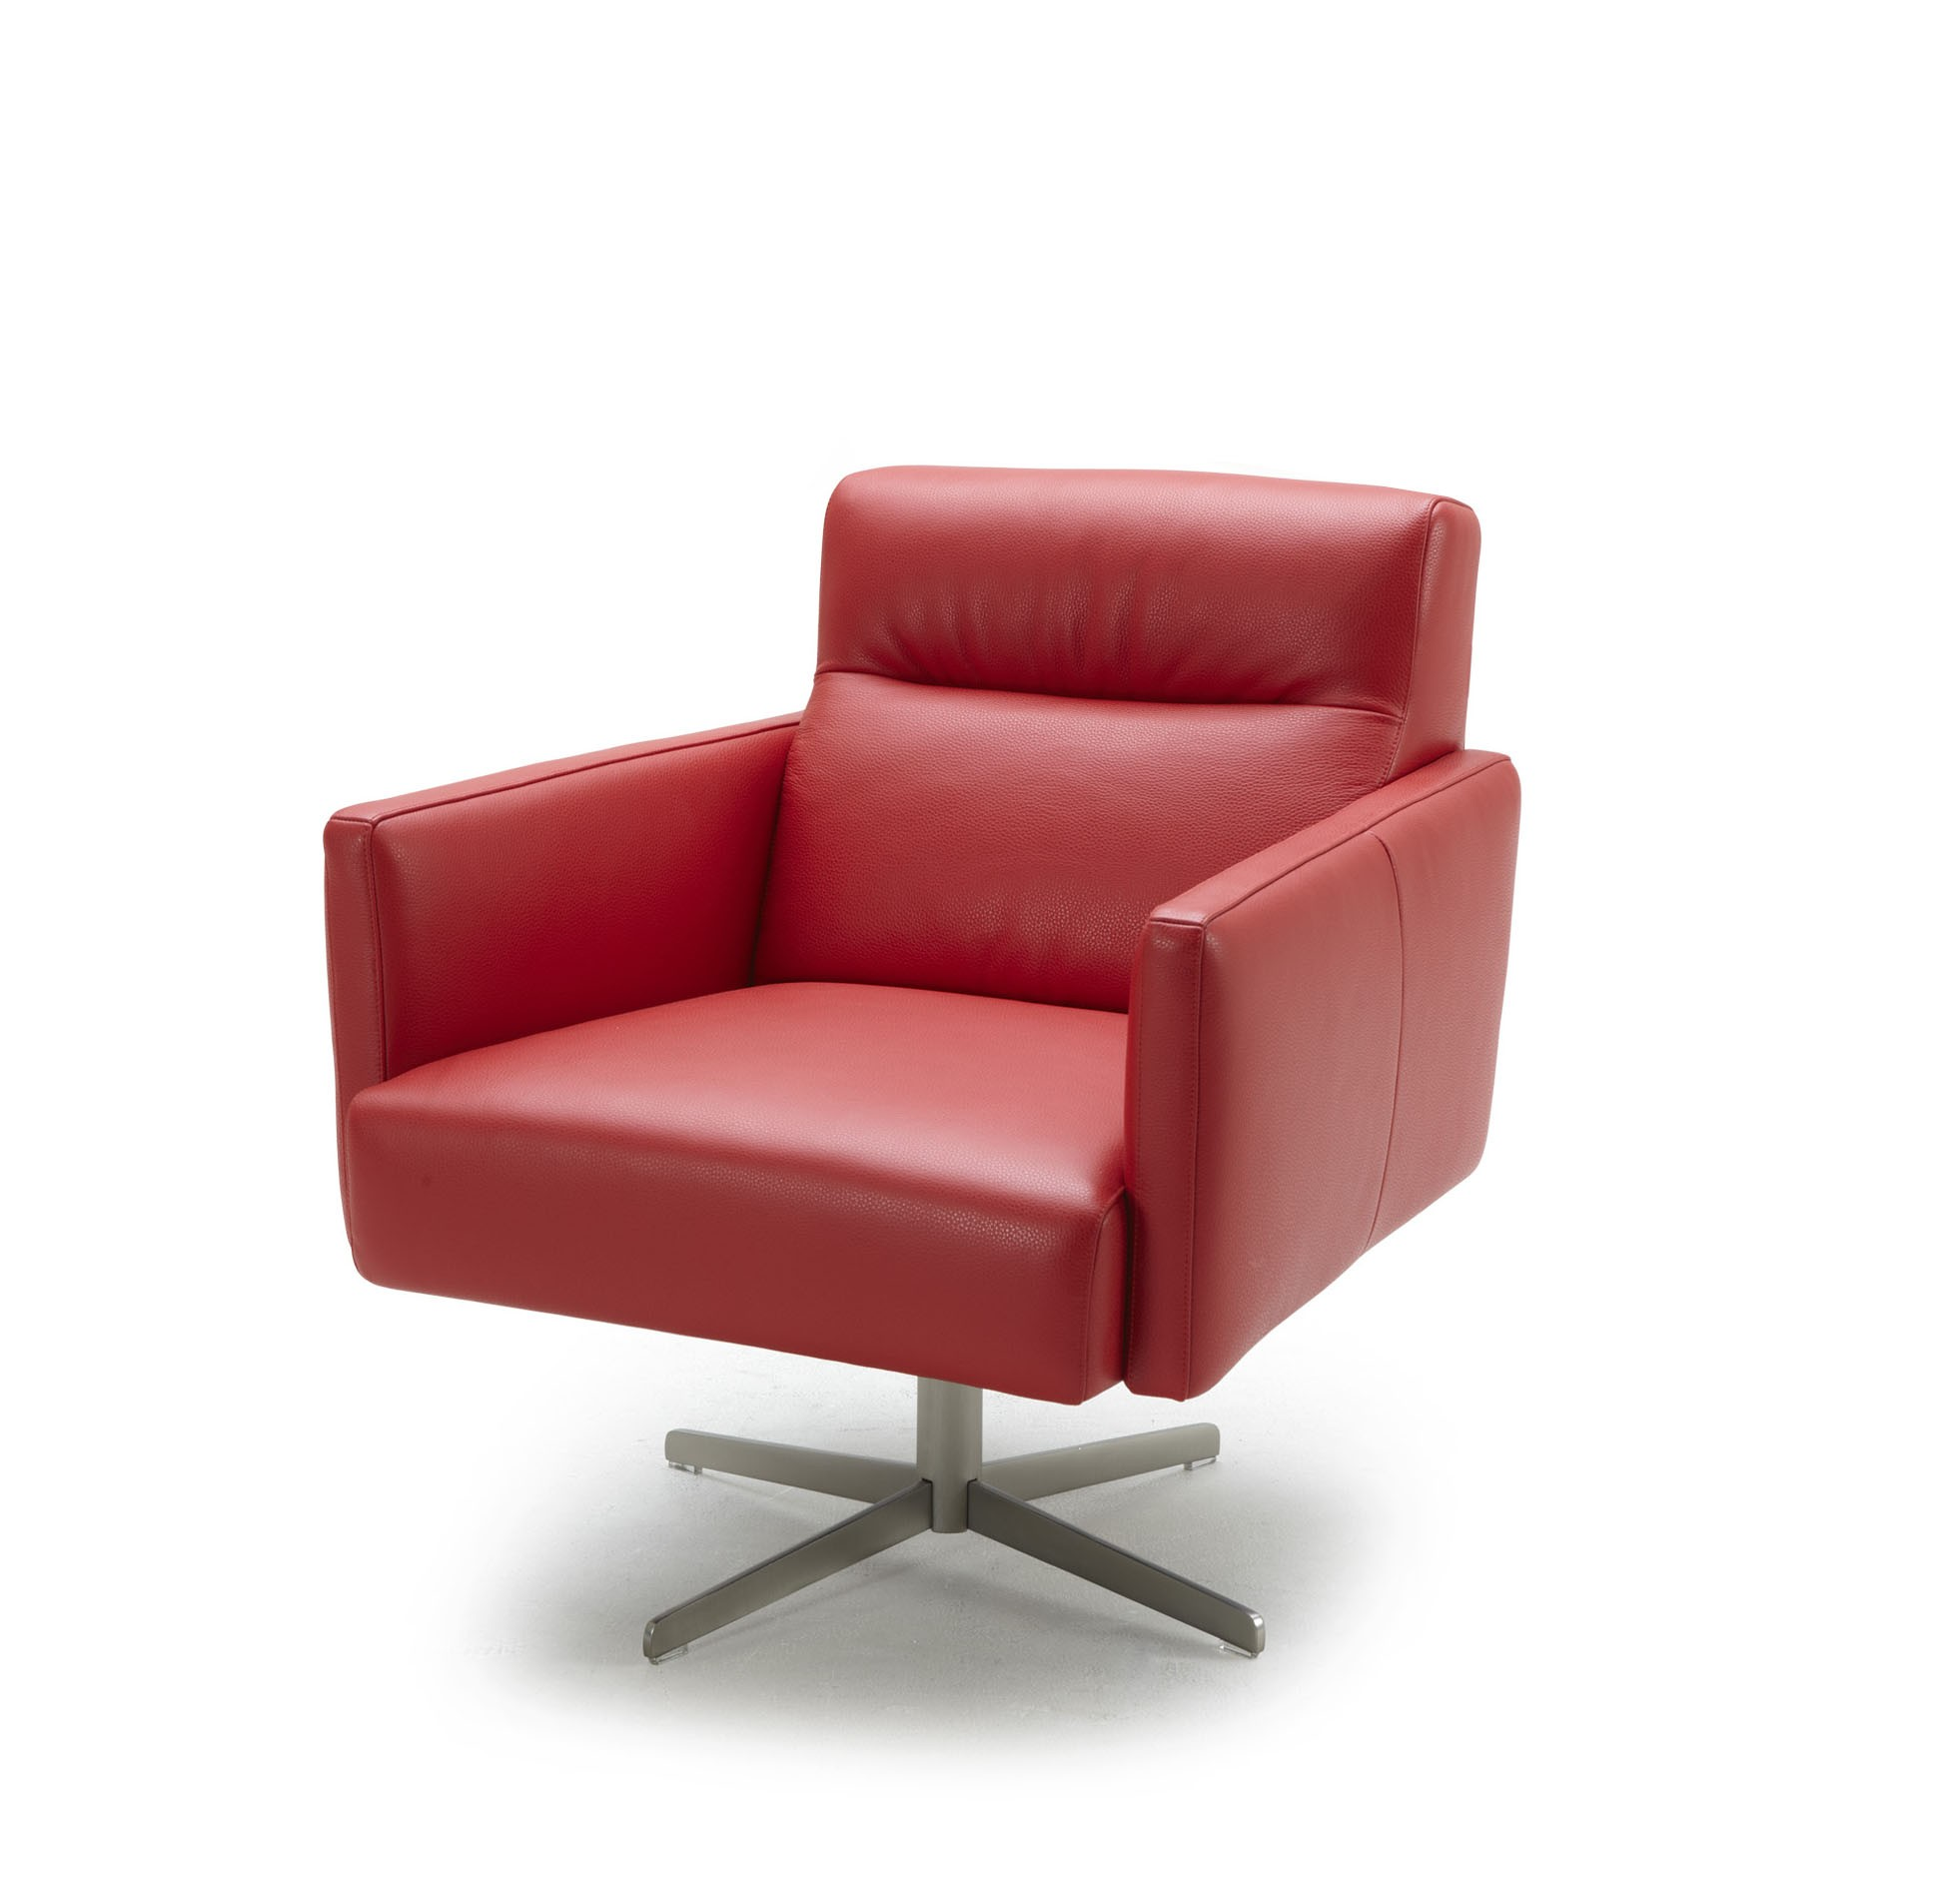 EVA Leather Swivel Chair